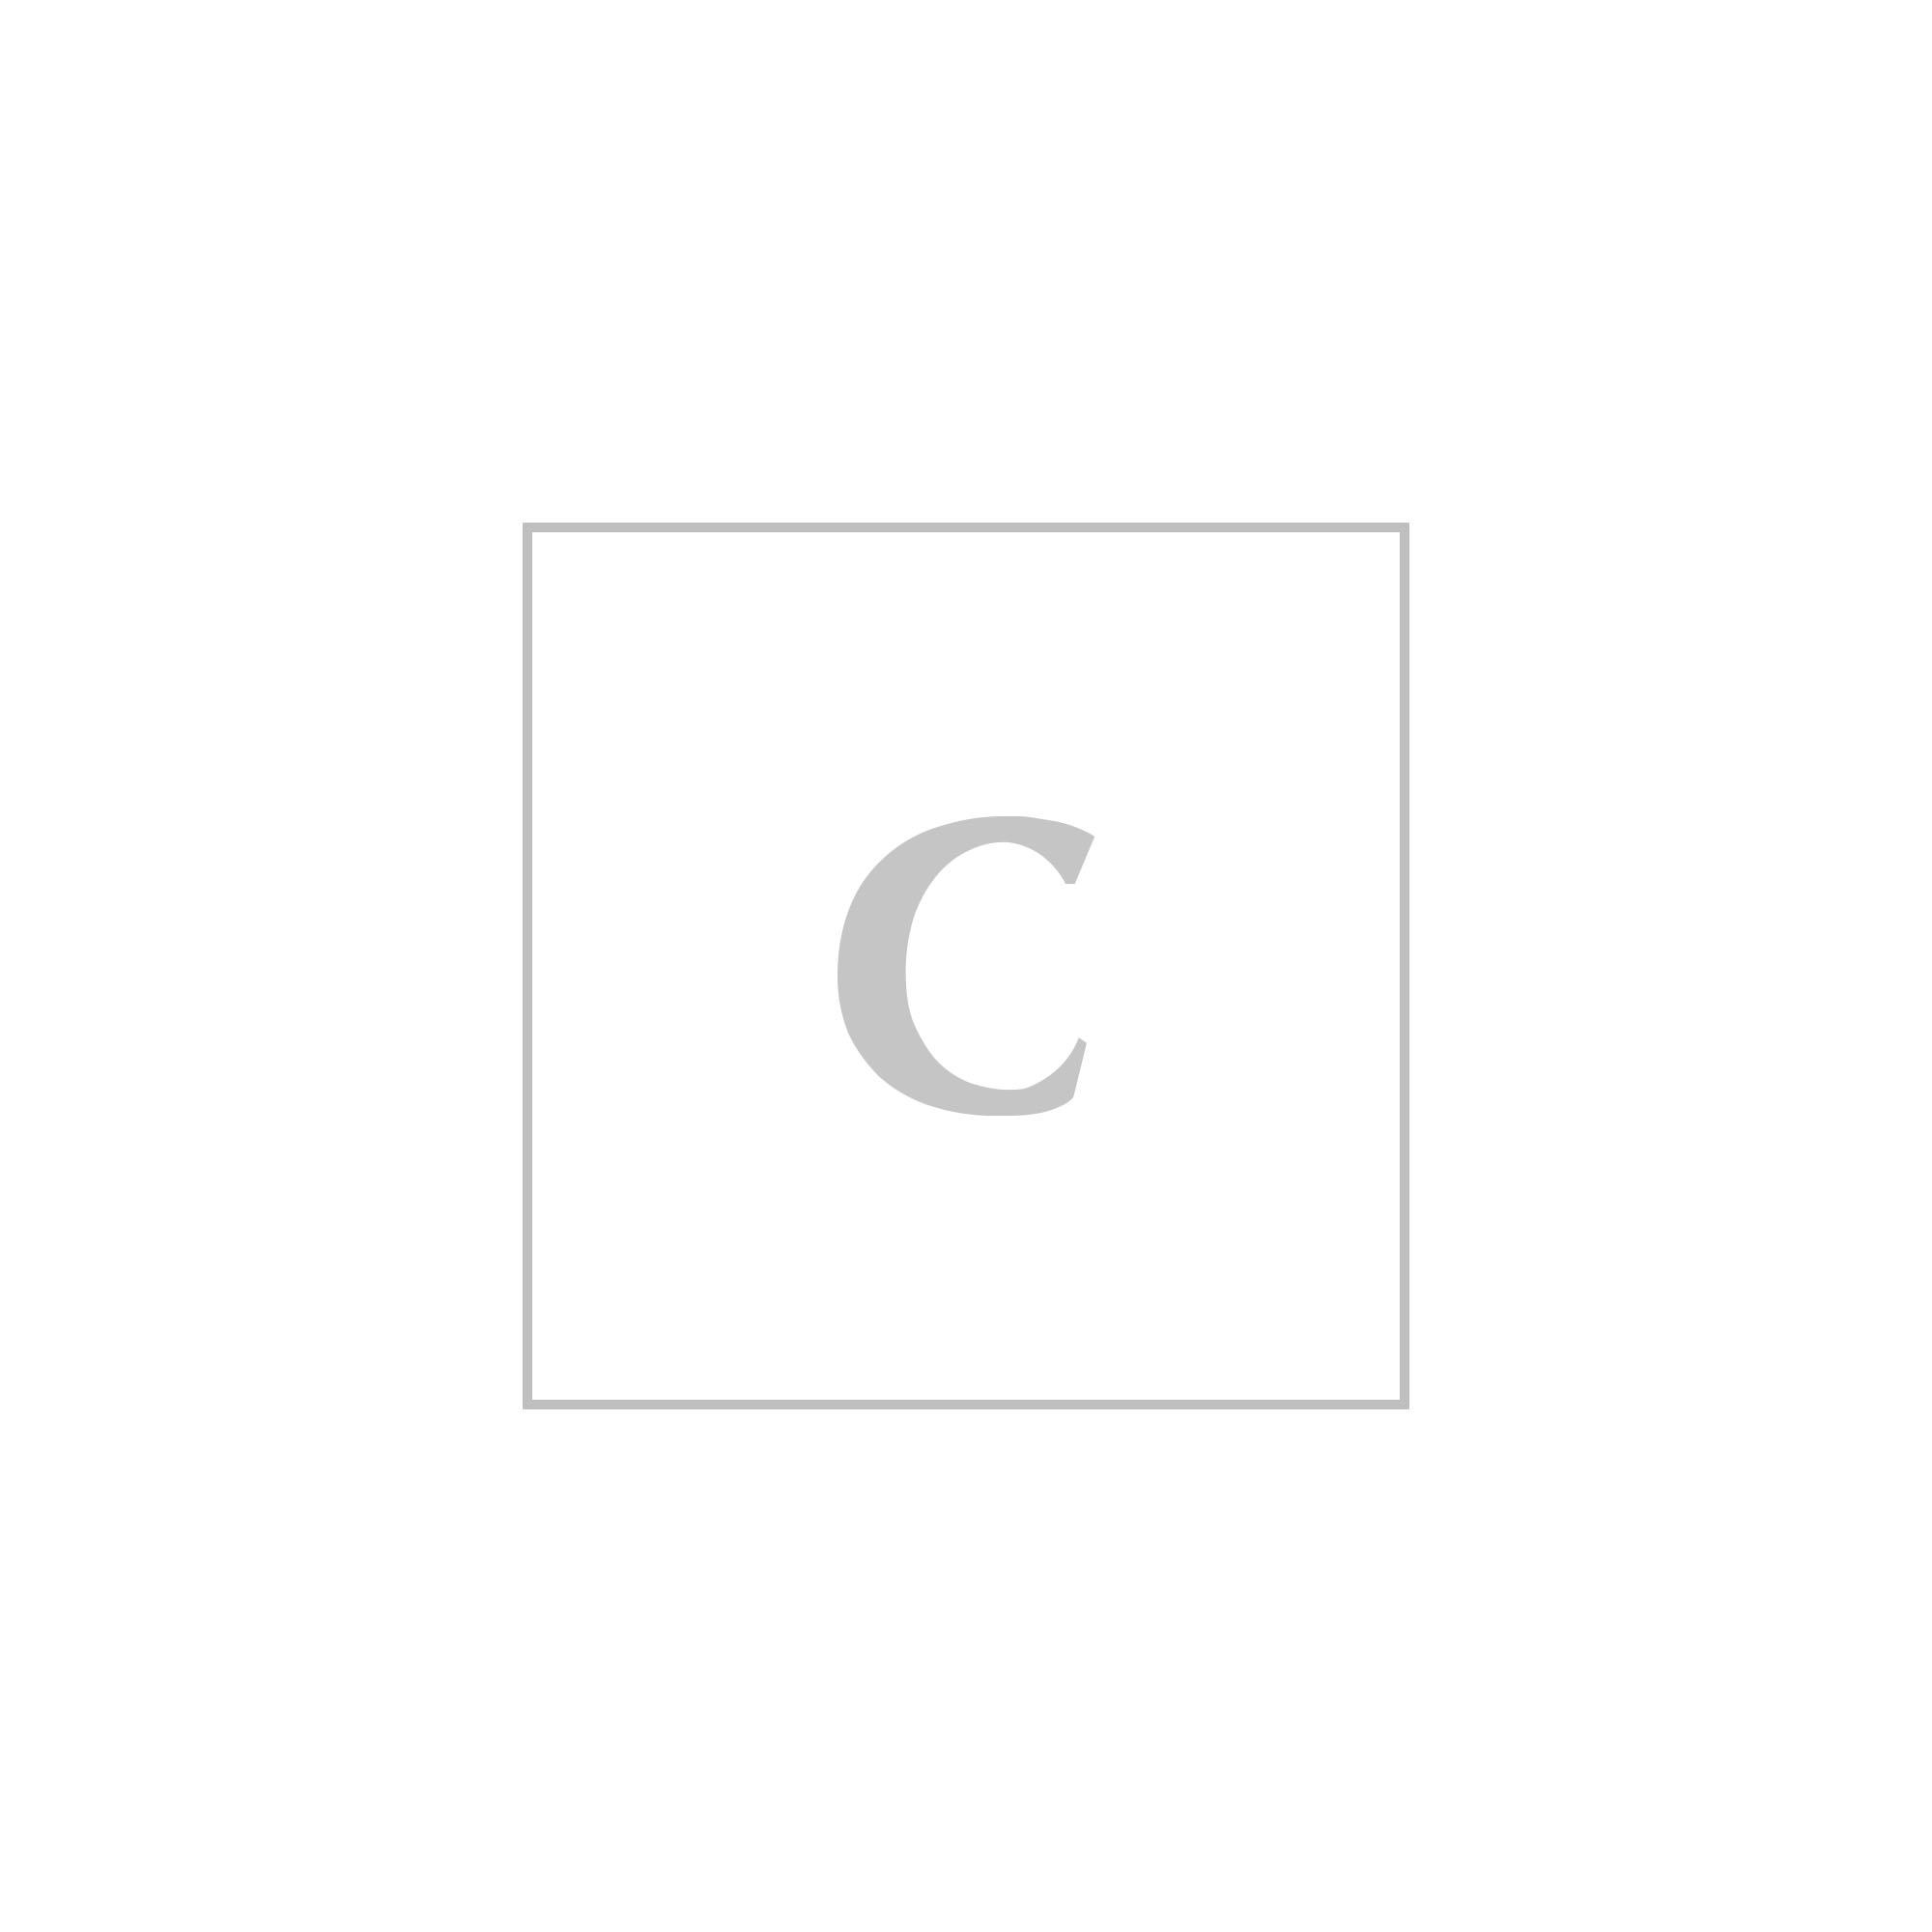 chloe' borse donna borsa  tess stampa coccodrillo